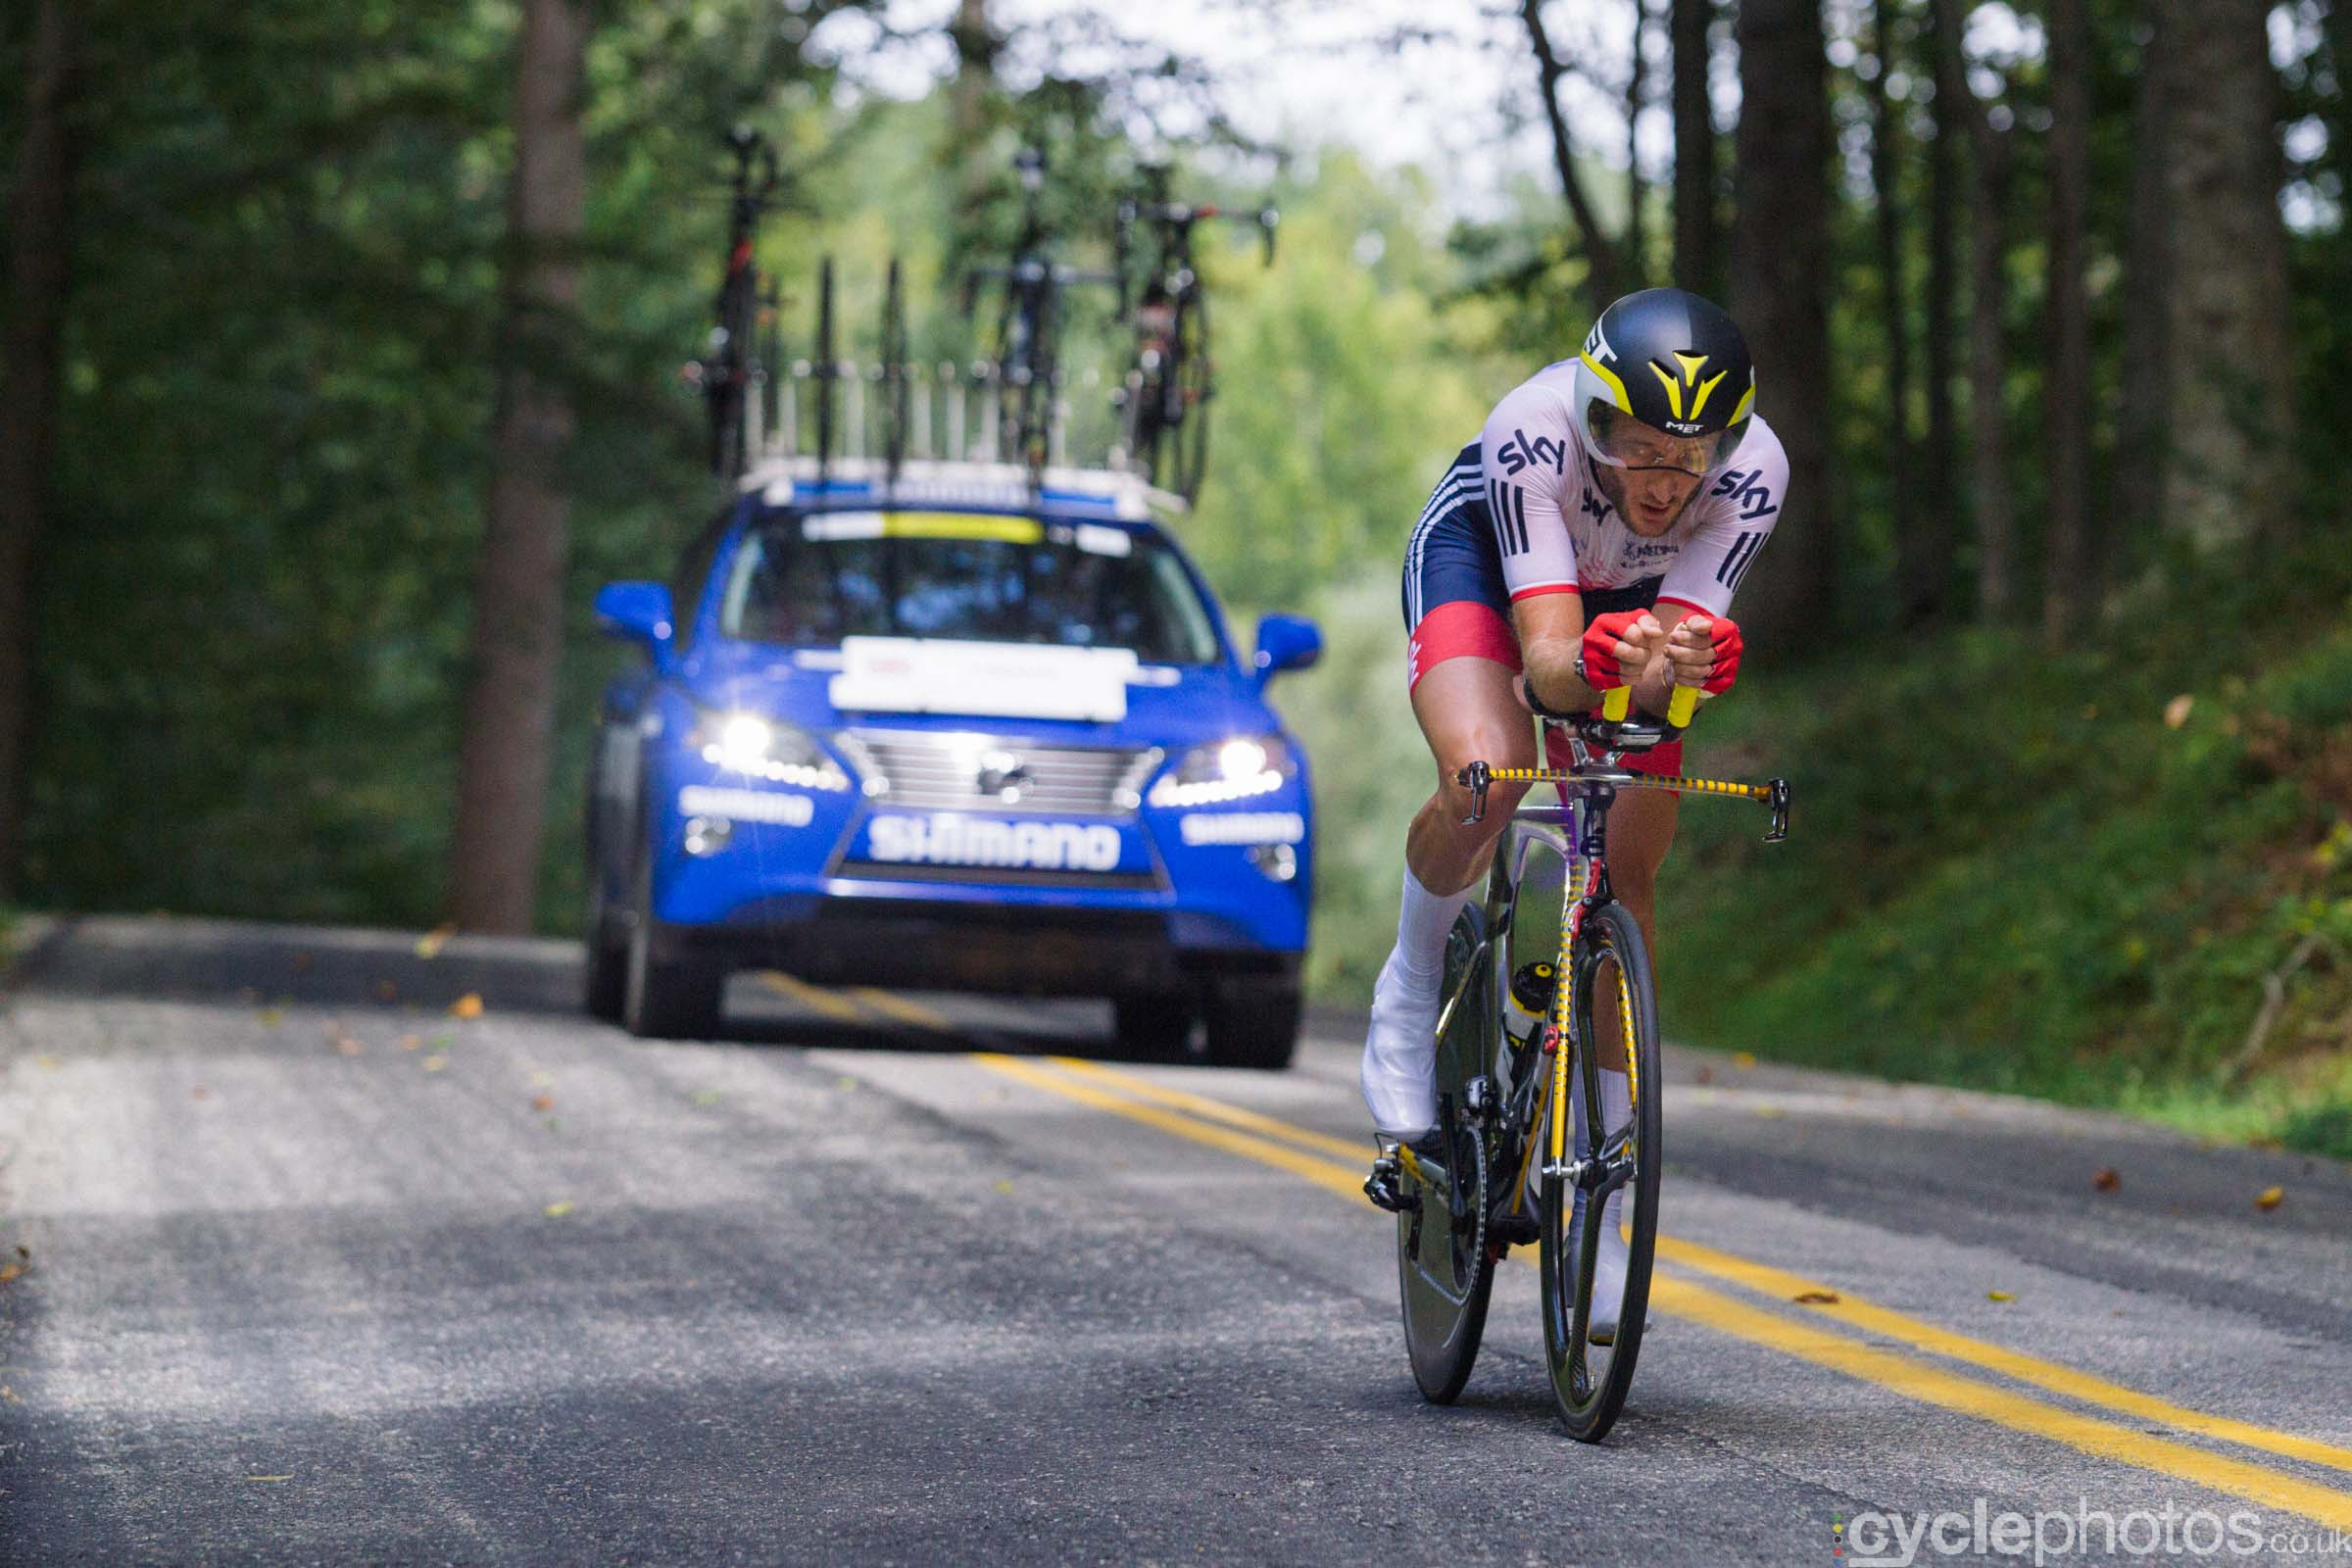 cyclephotos-world-champs-richmond-135512